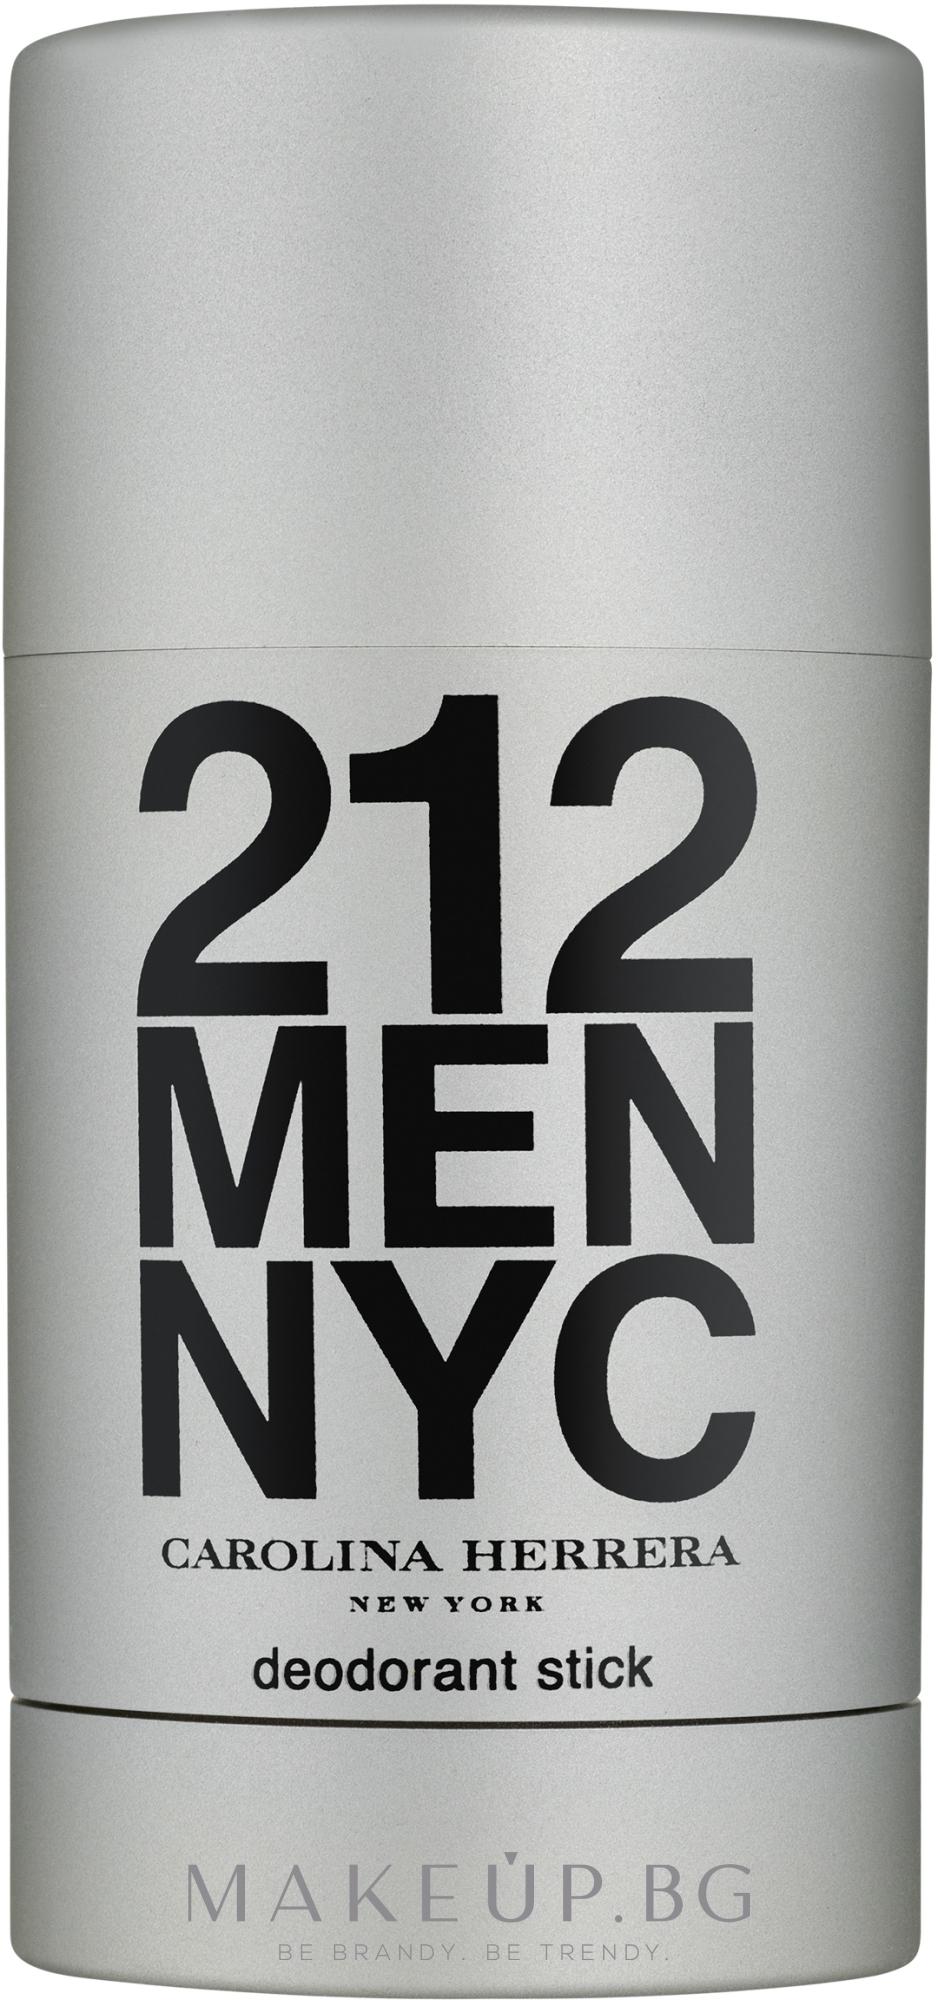 Carolina Herrera 212 For Man NYC - Стик дезодорант  — снимка 75 ml